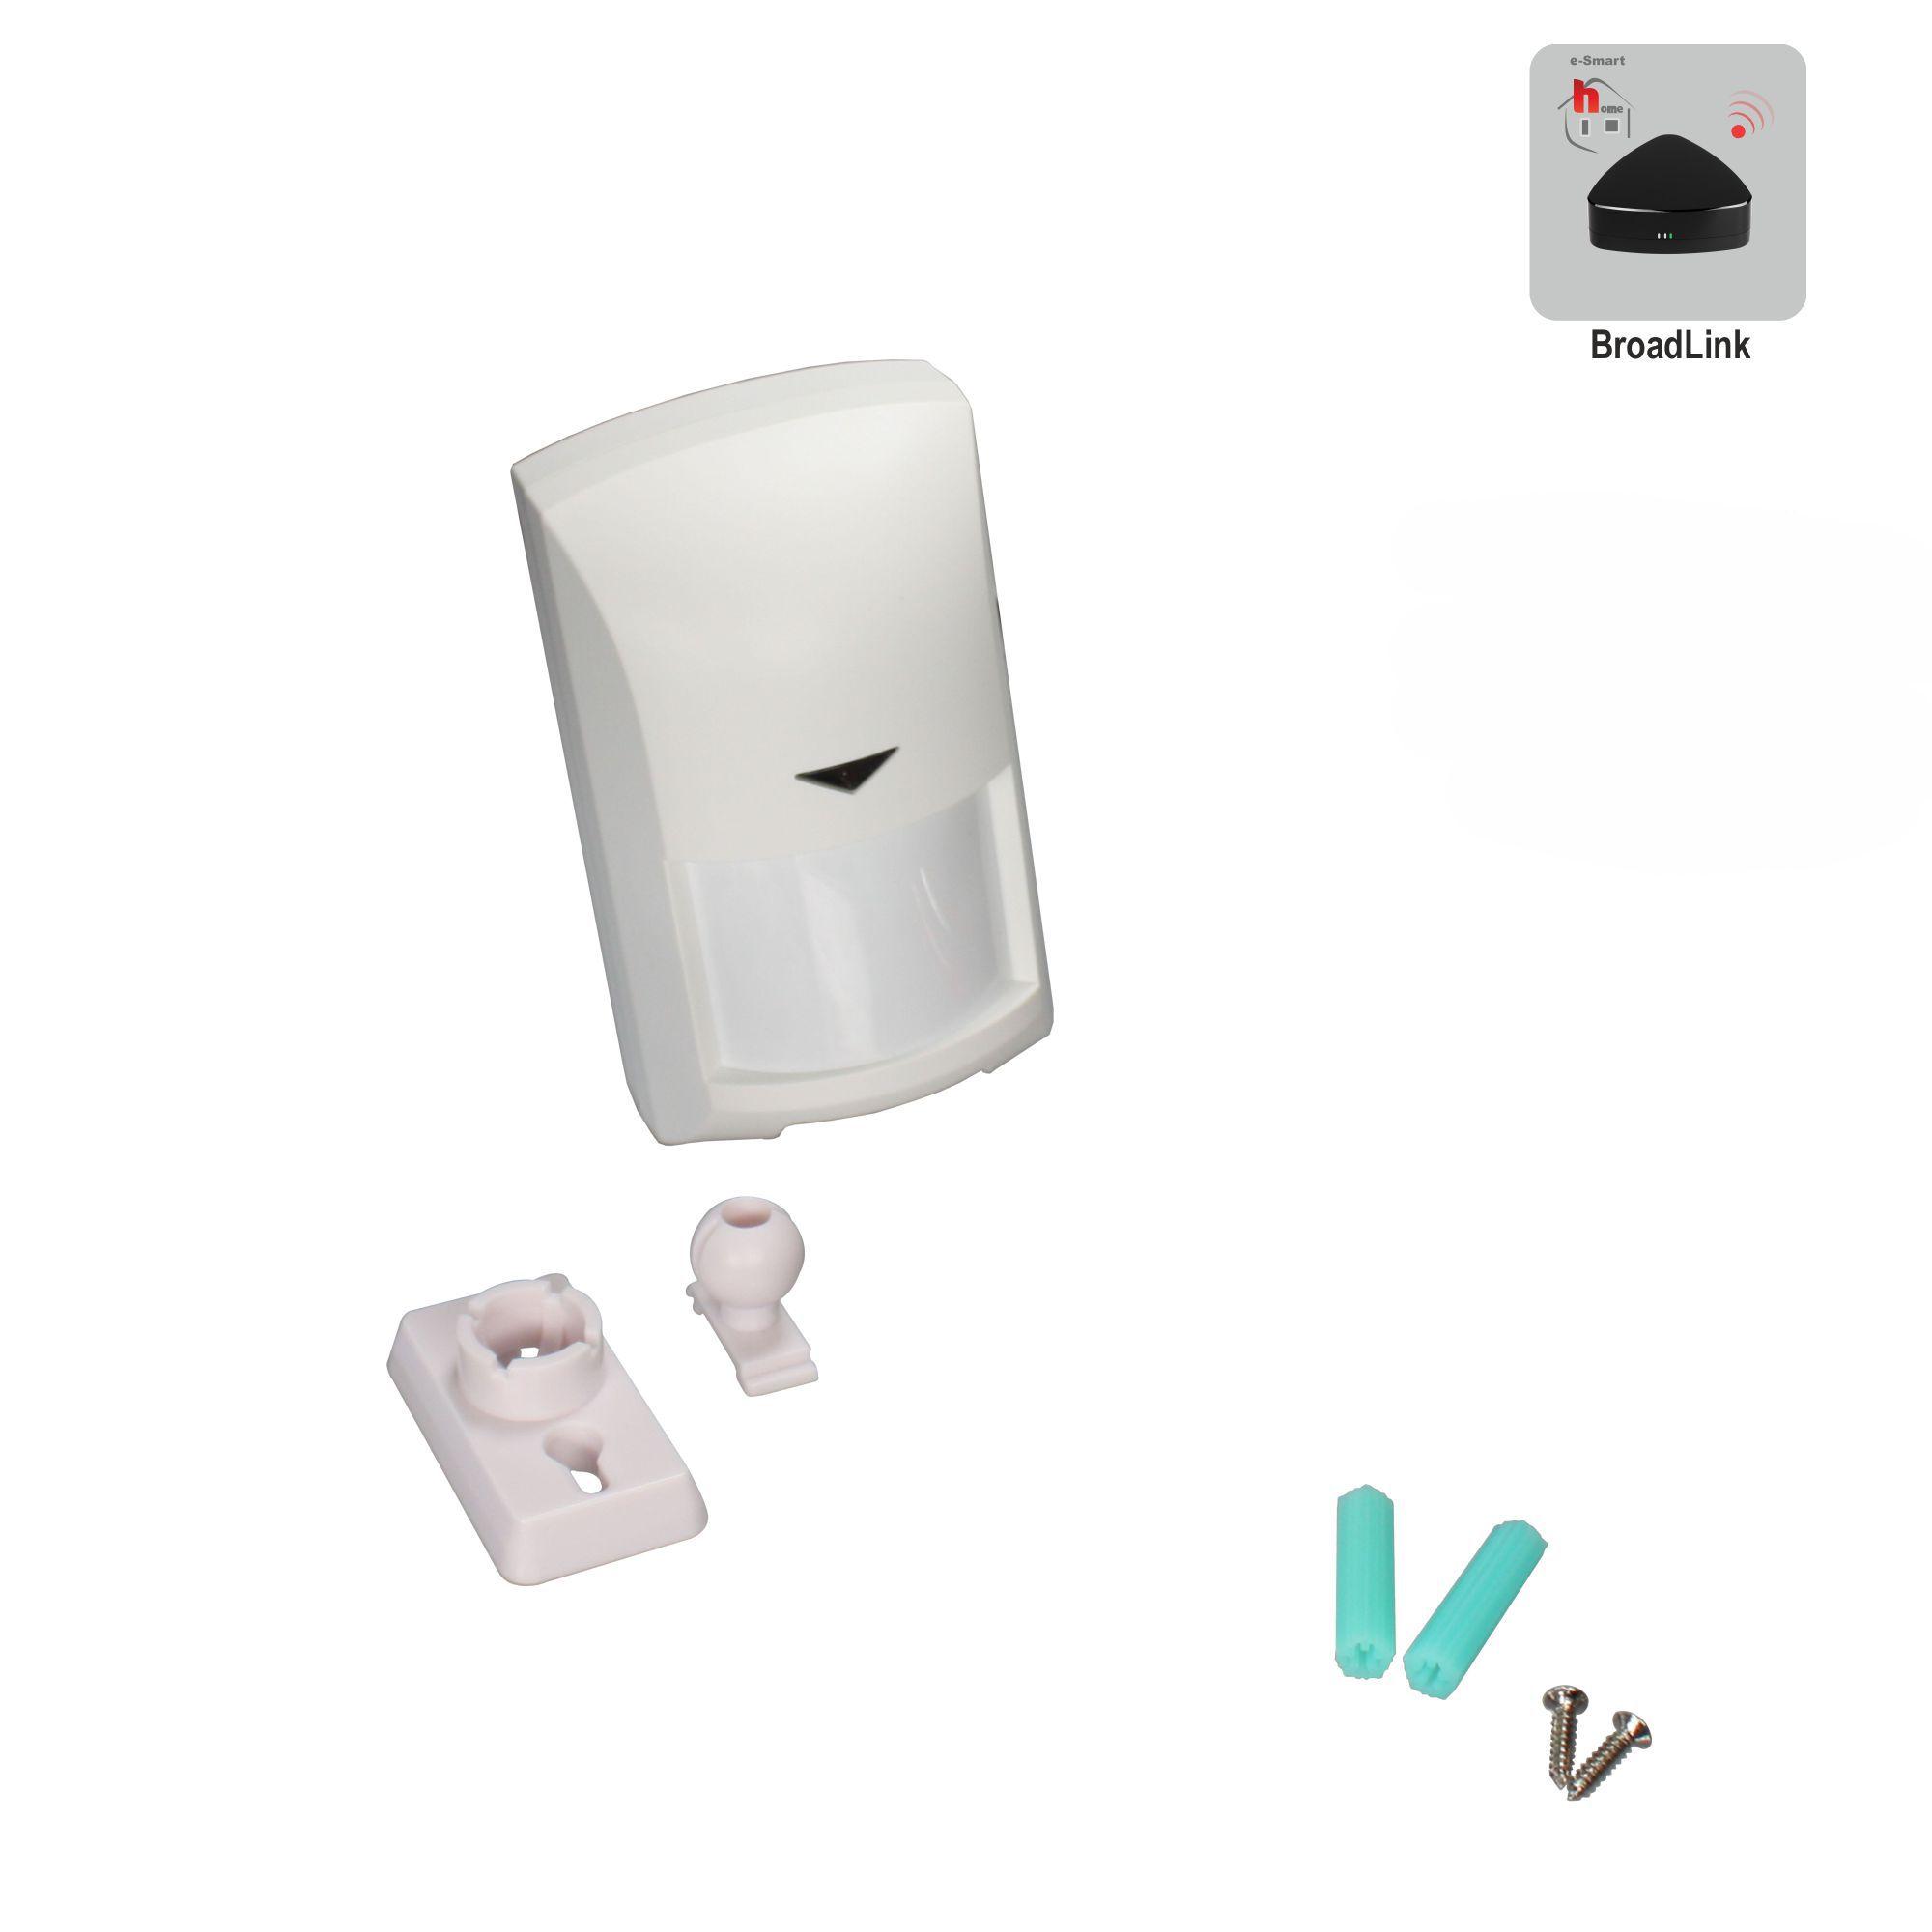 heicko schraubenvertriebs gmbh e smart home motion sensor 110x62x47mm. Black Bedroom Furniture Sets. Home Design Ideas